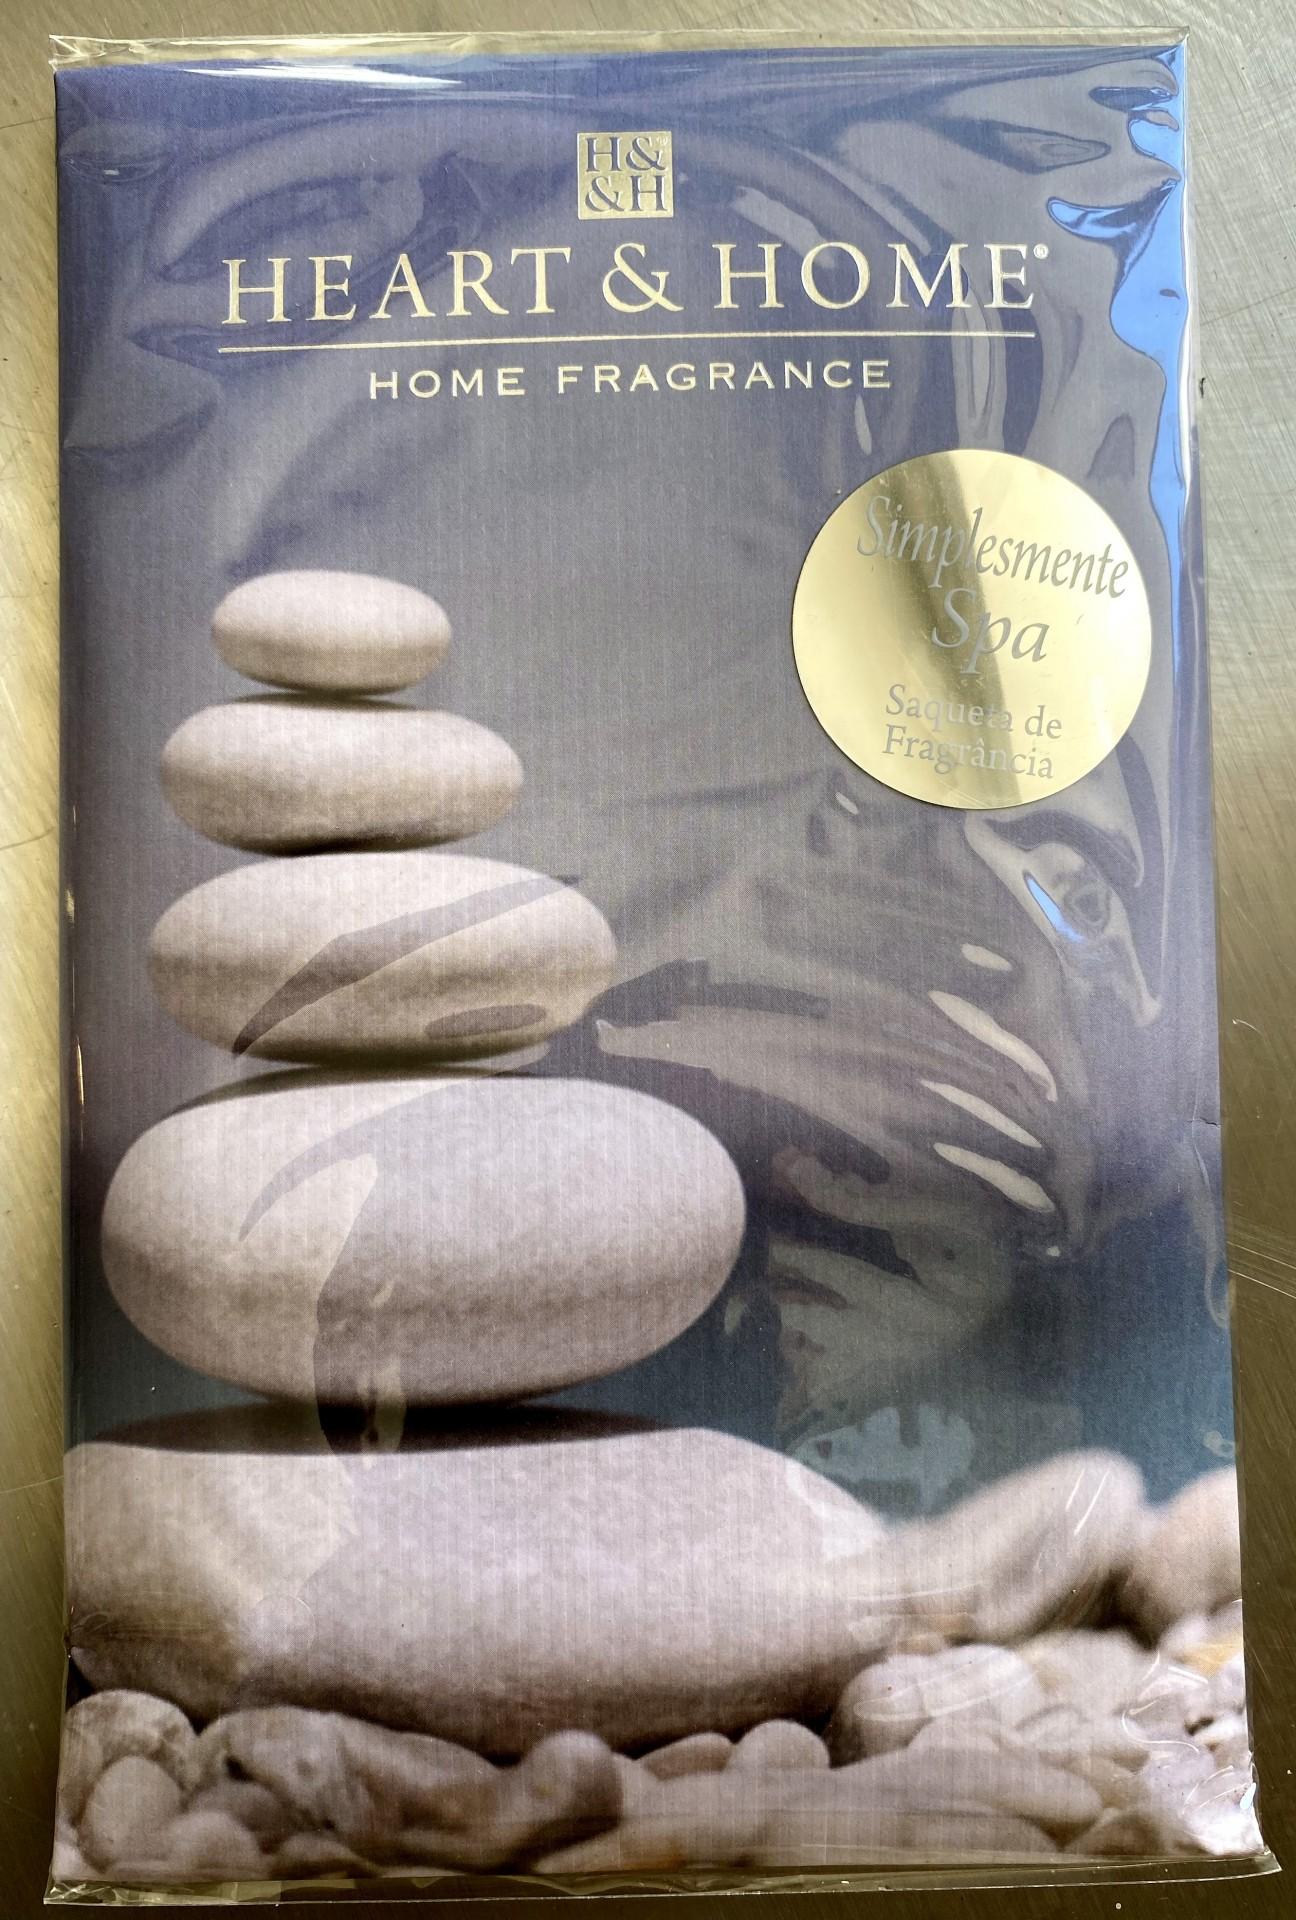 Sachet perfumado Simplesmente SPA Heart & Home